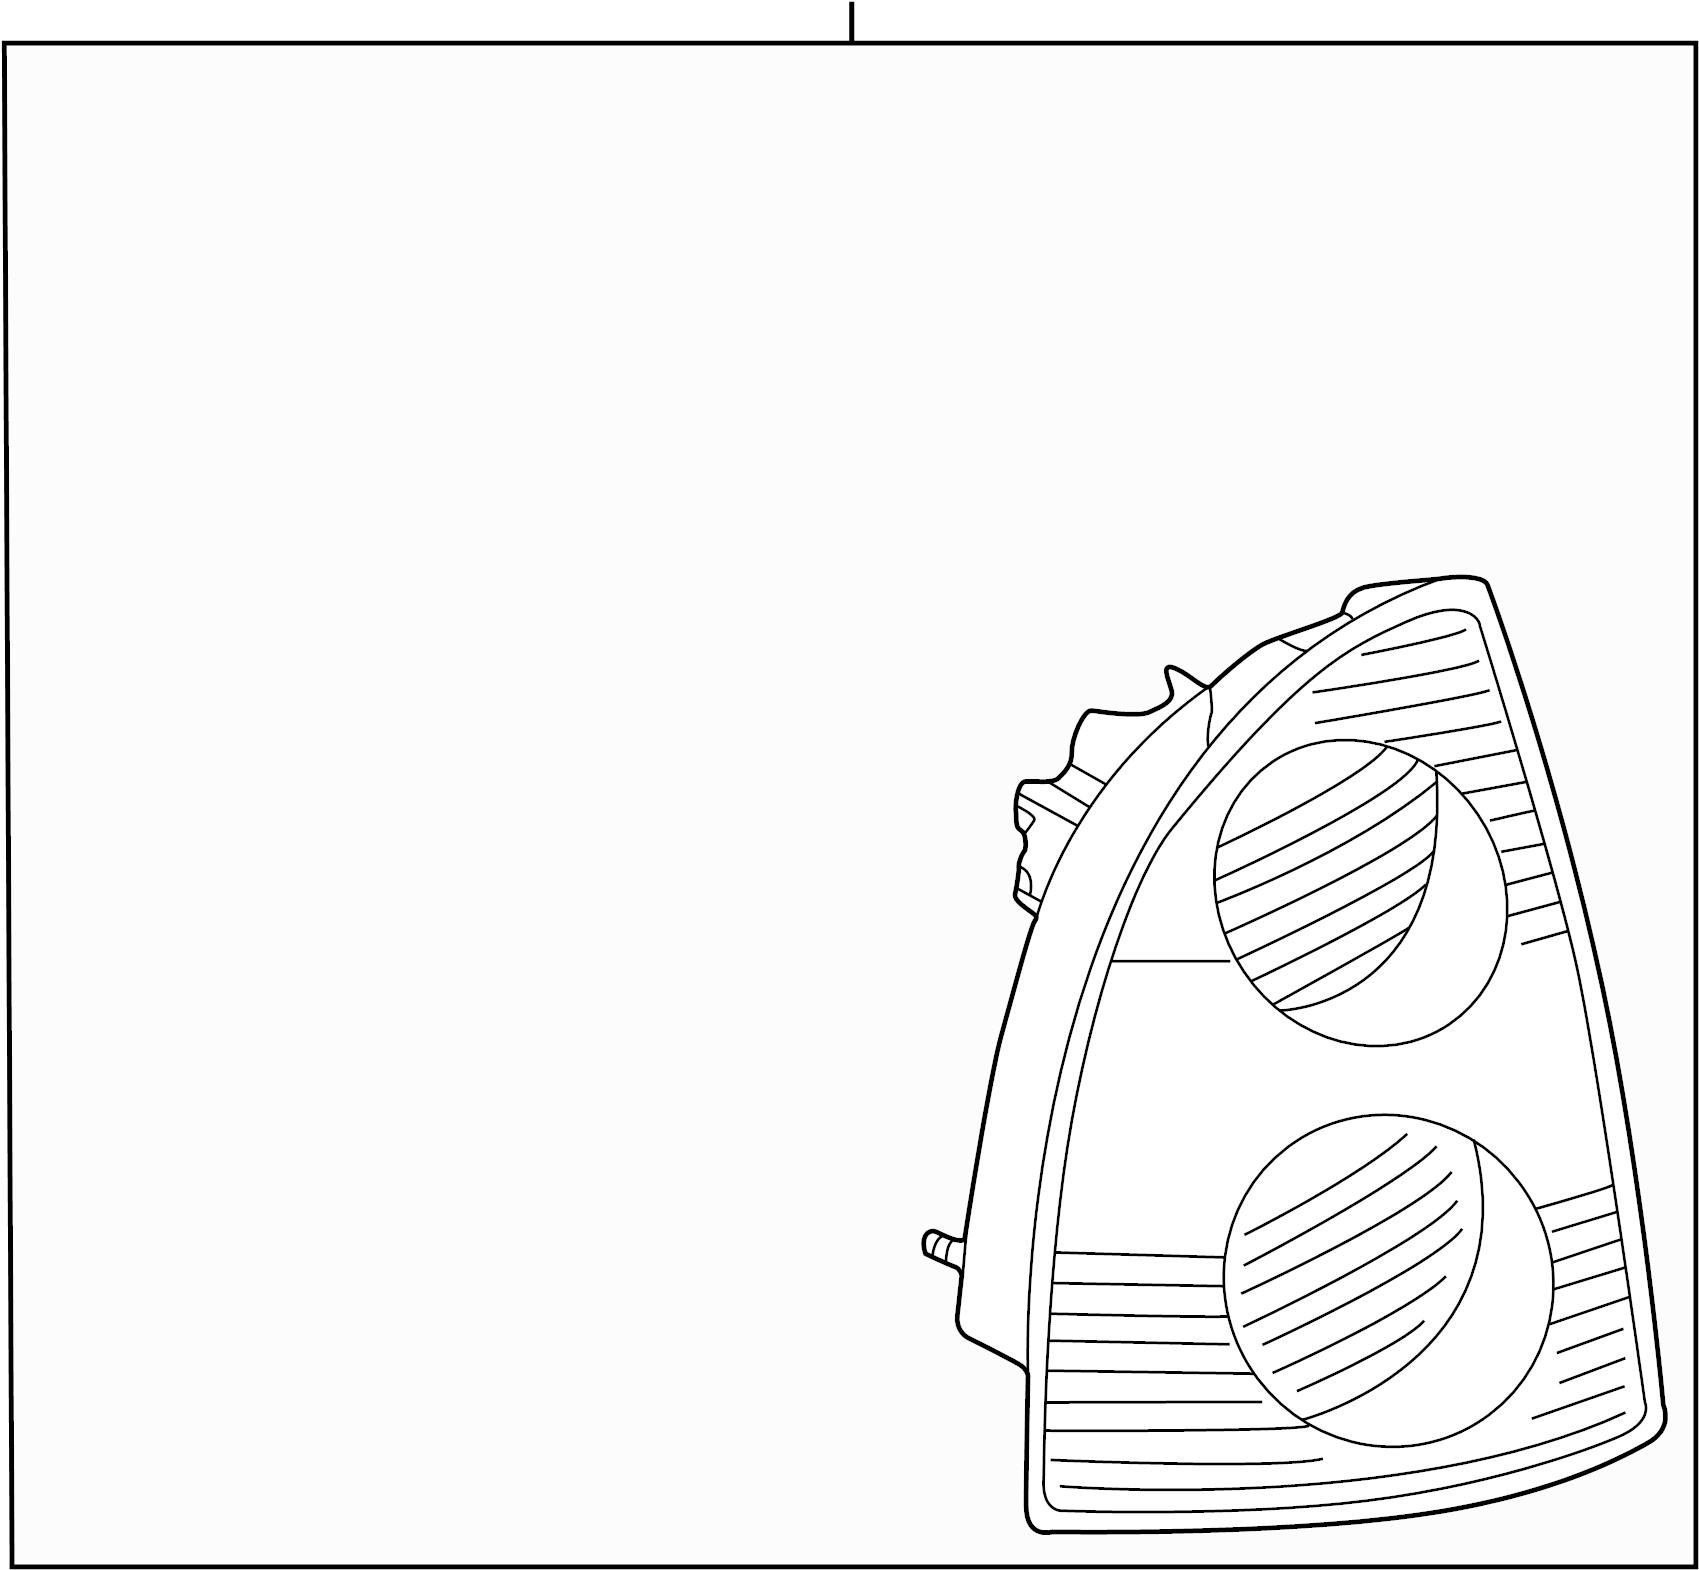 Volkswagen Passat Wagon Tail lamp ASSEMBLY. TAILLIGHT